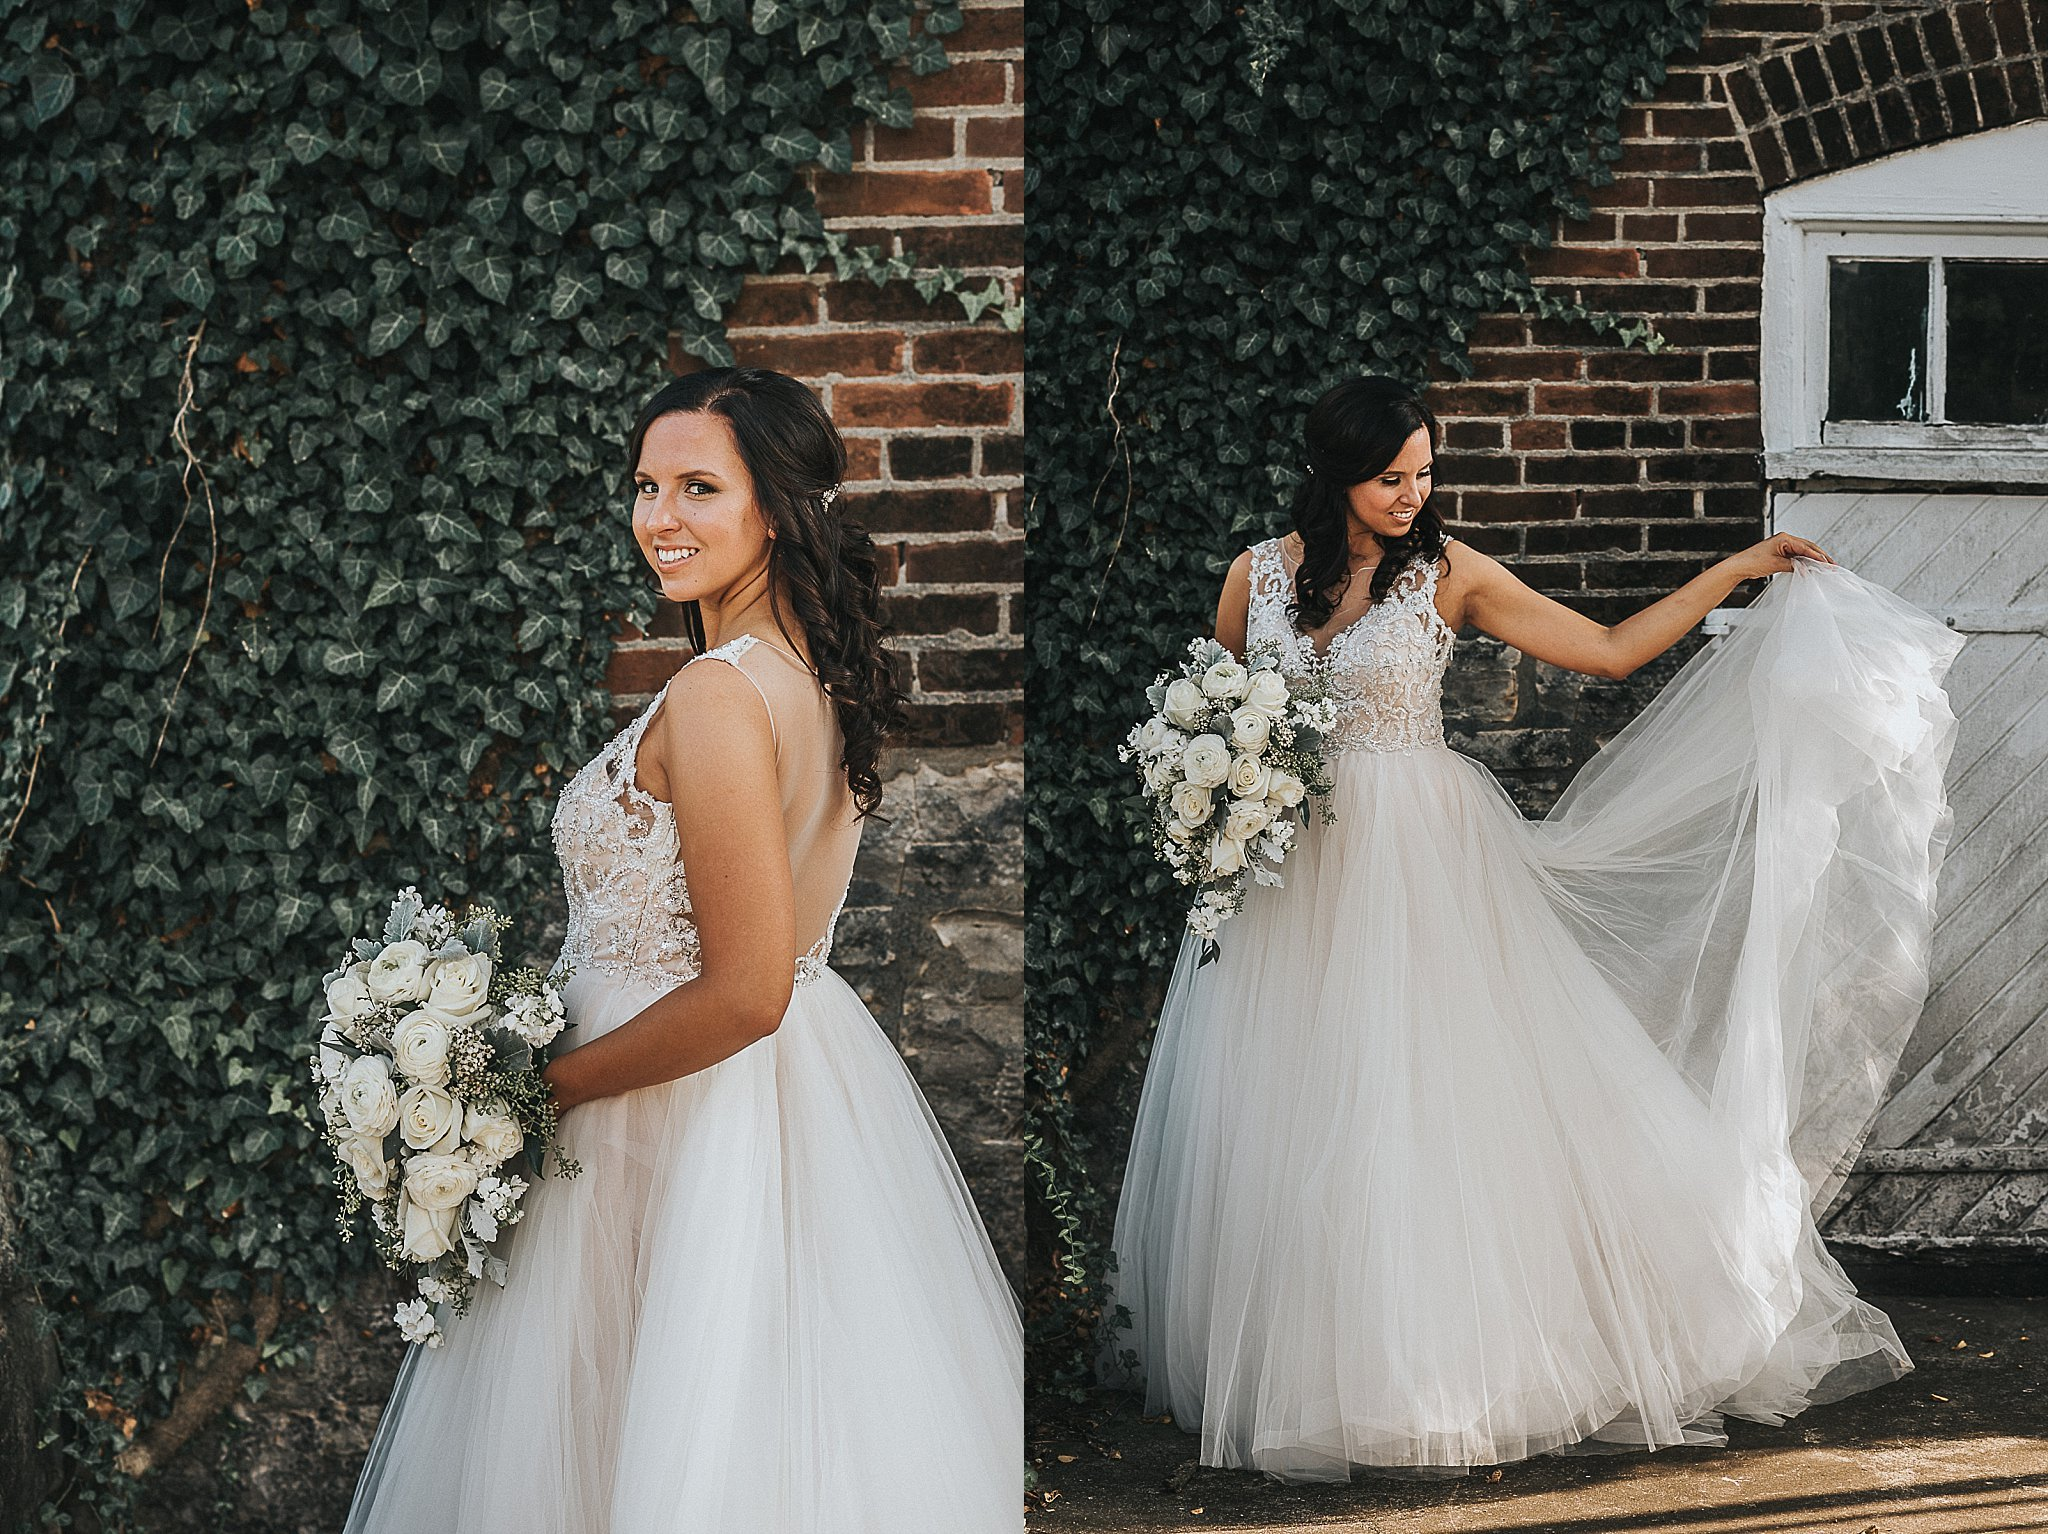 Bride photos in St. Louis